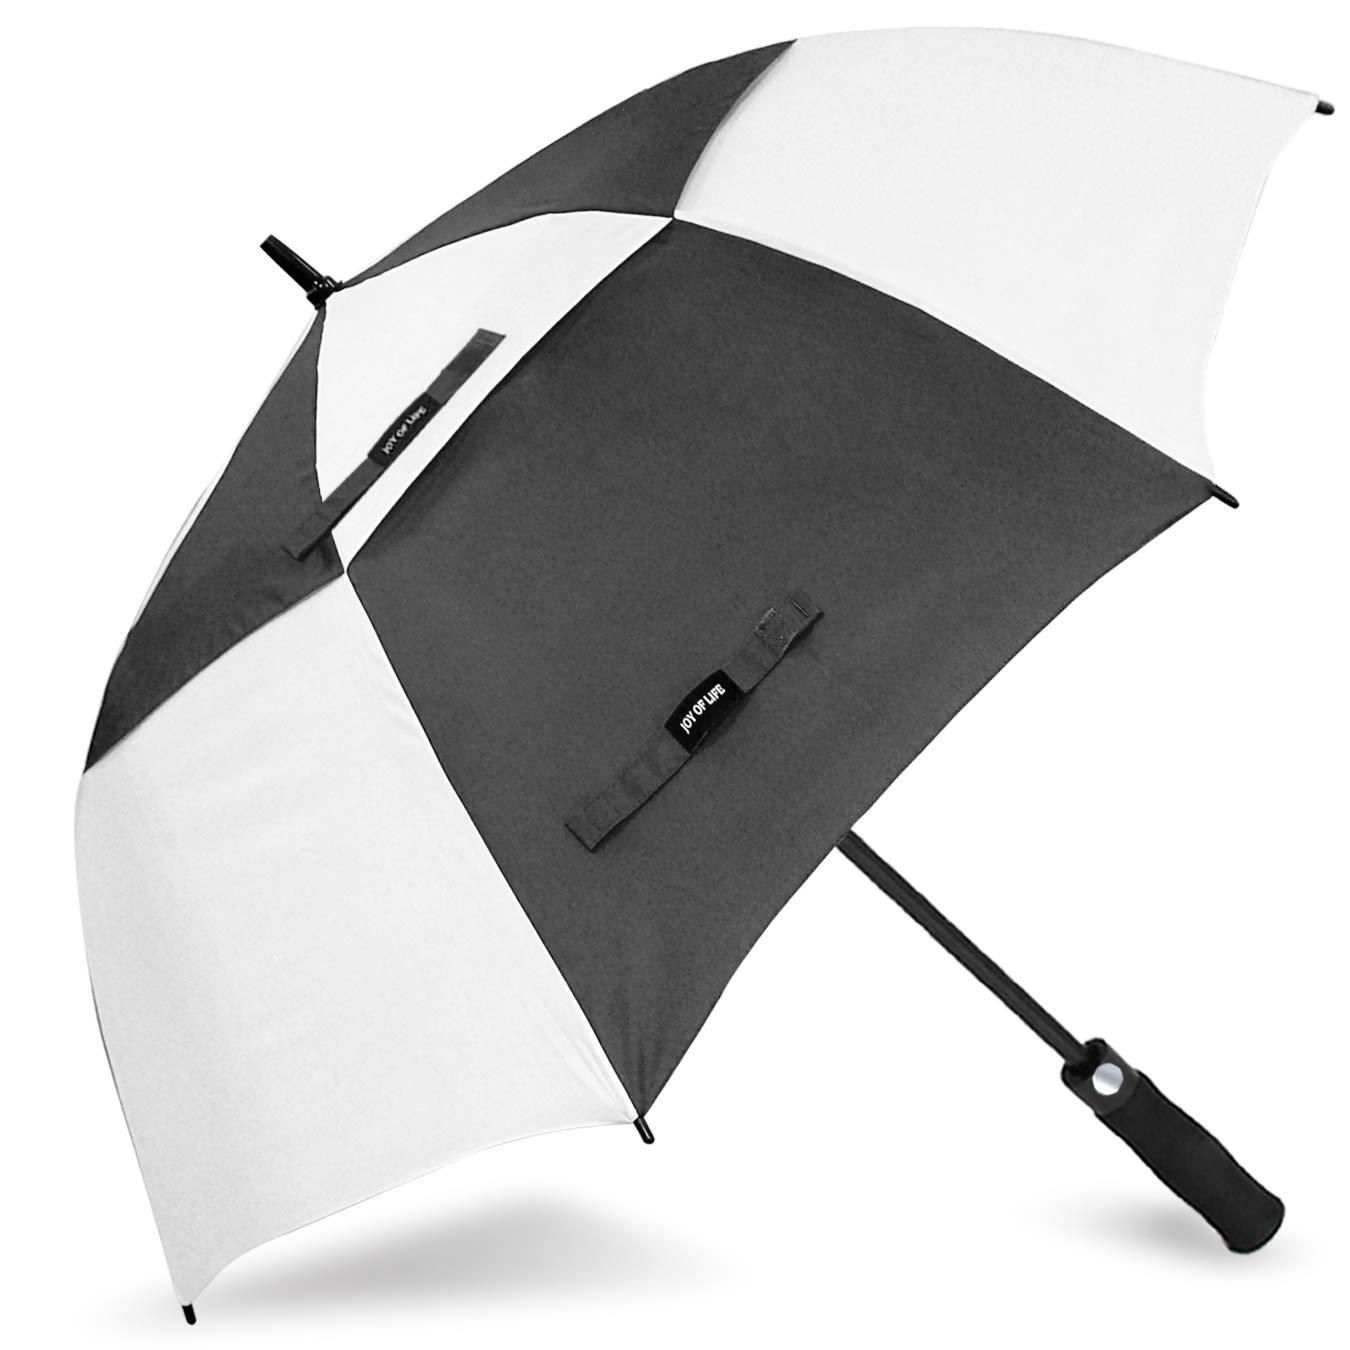 ZOMAKE Golf Umbrella Windproof Large 62 inch Double Canopy Automatic Open Umbrella for Men - Vented Sun Umbrella - Stick Umbrellas